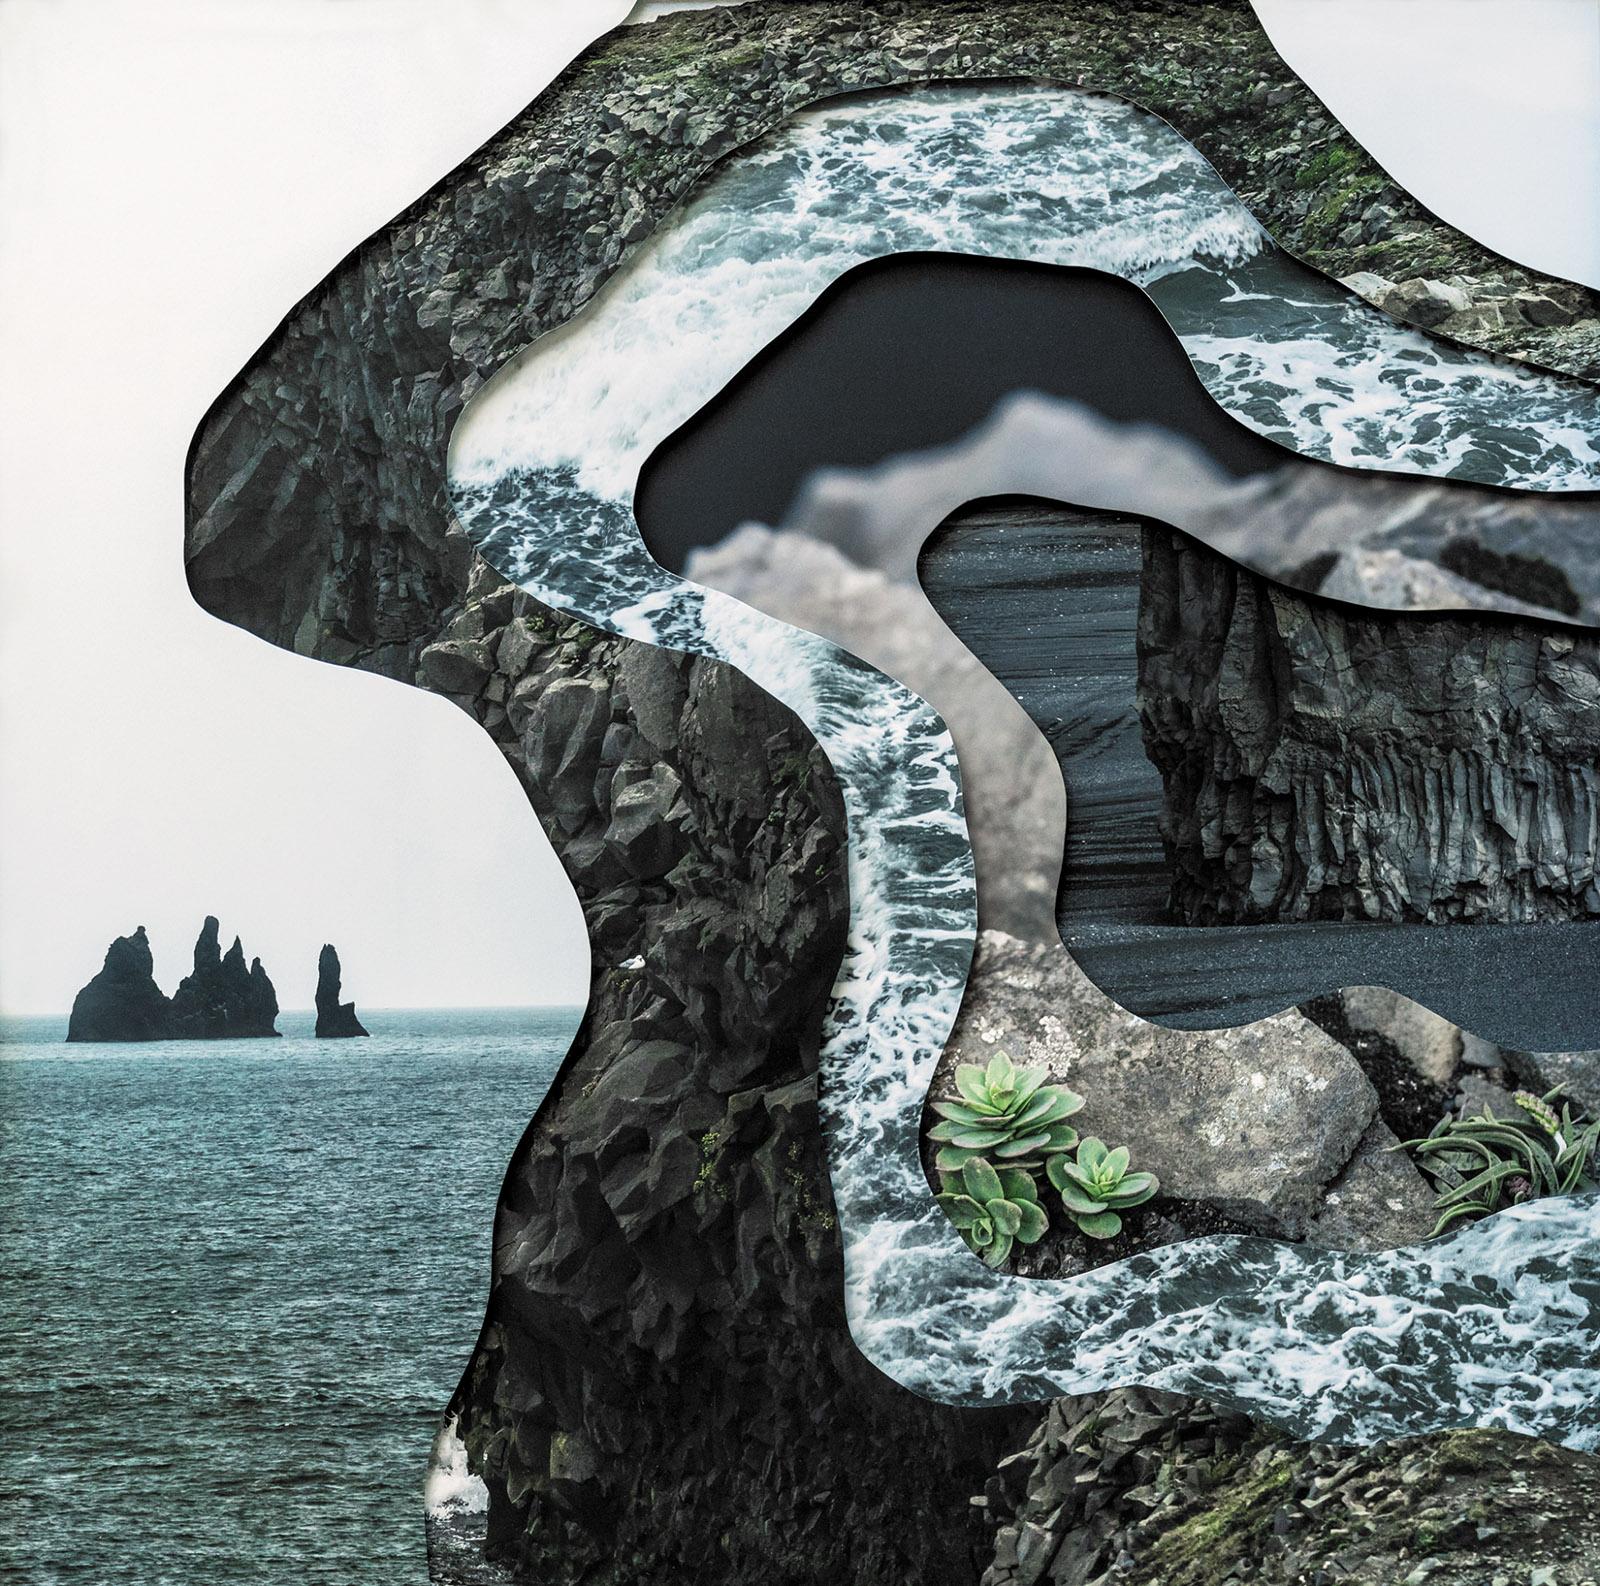 Charlotta María Hauksdóttir: Topography Study XVI, 2018; from Hauksdóttir's book A Sense of Place: Imprints from Iceland, to be published by Daylight in January 2020